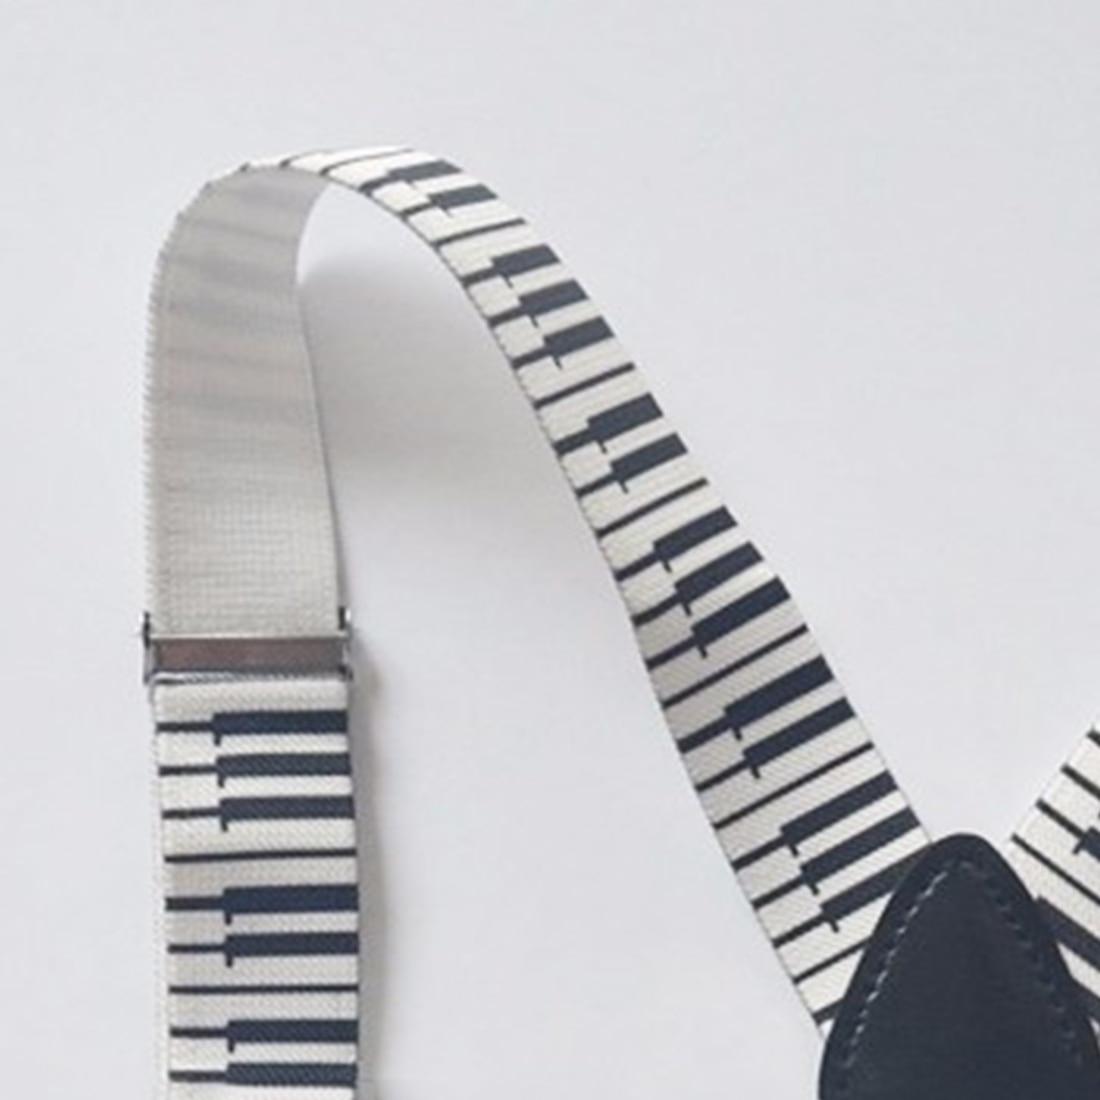 Charming 2.5cm/1Inch Wide Men Unisex Piano Key Board Pattern Suspender Clip-On Braces Elastic Braces Suspender Y-Back Suspenders